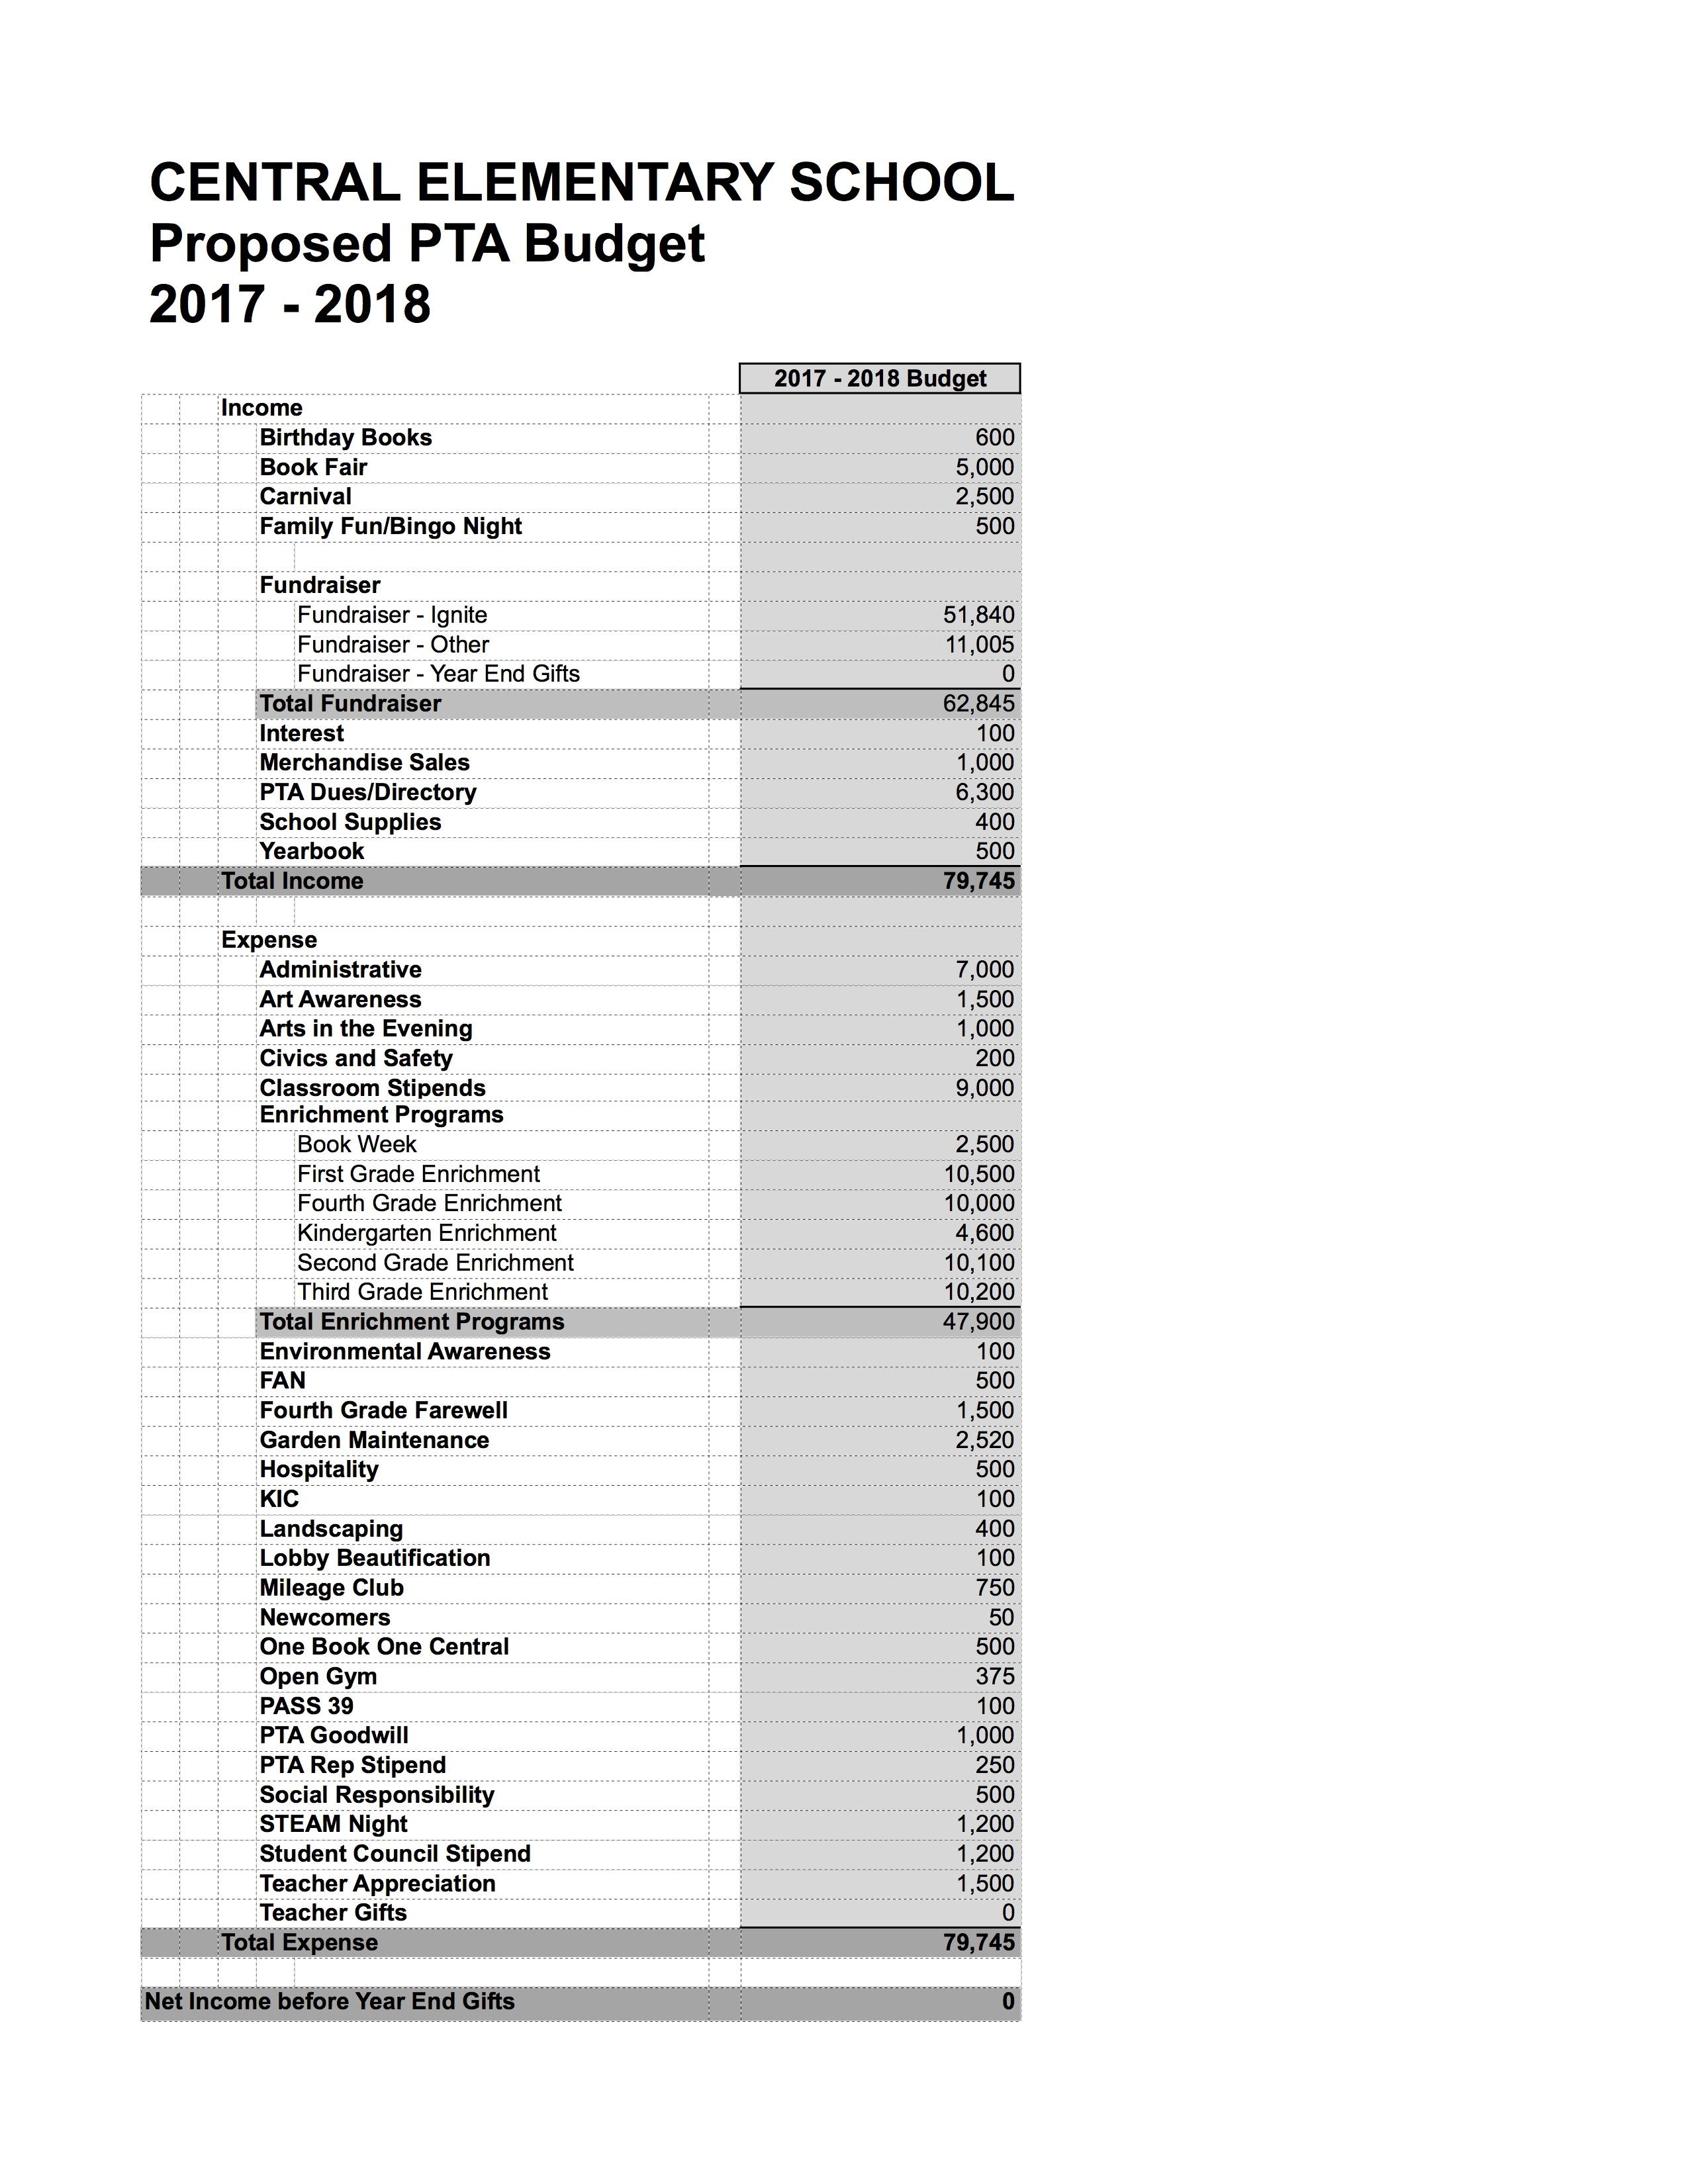 Proposed 2017_18 PTA Budget